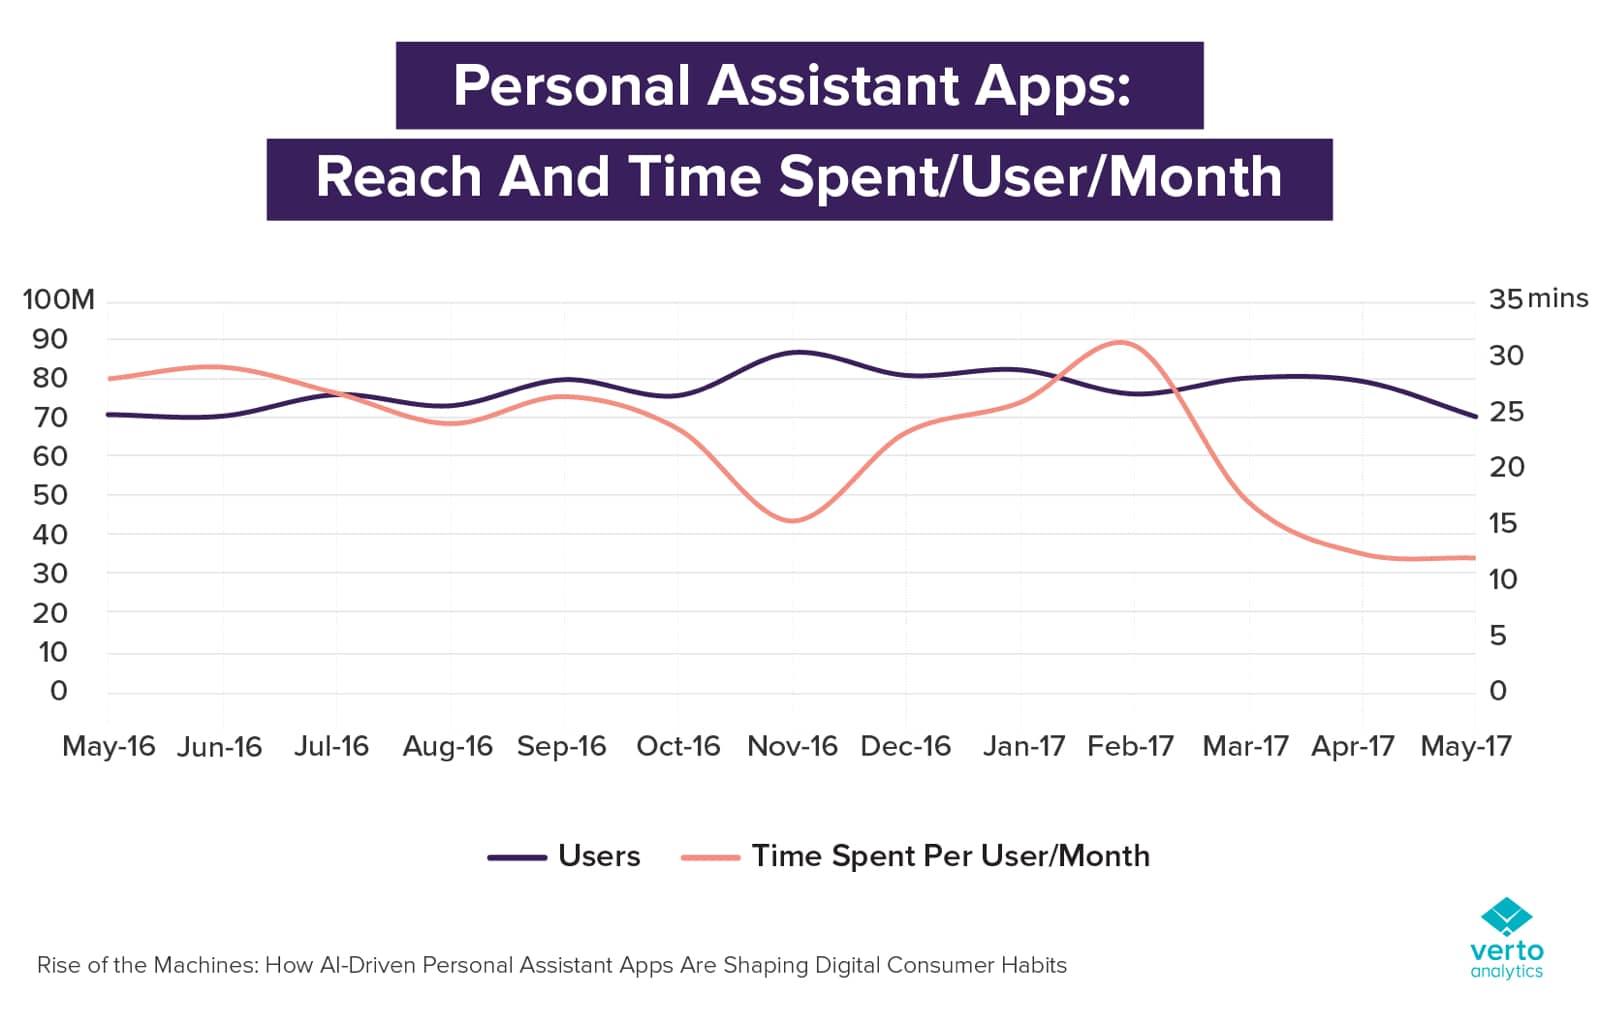 Siri usage spent each month.